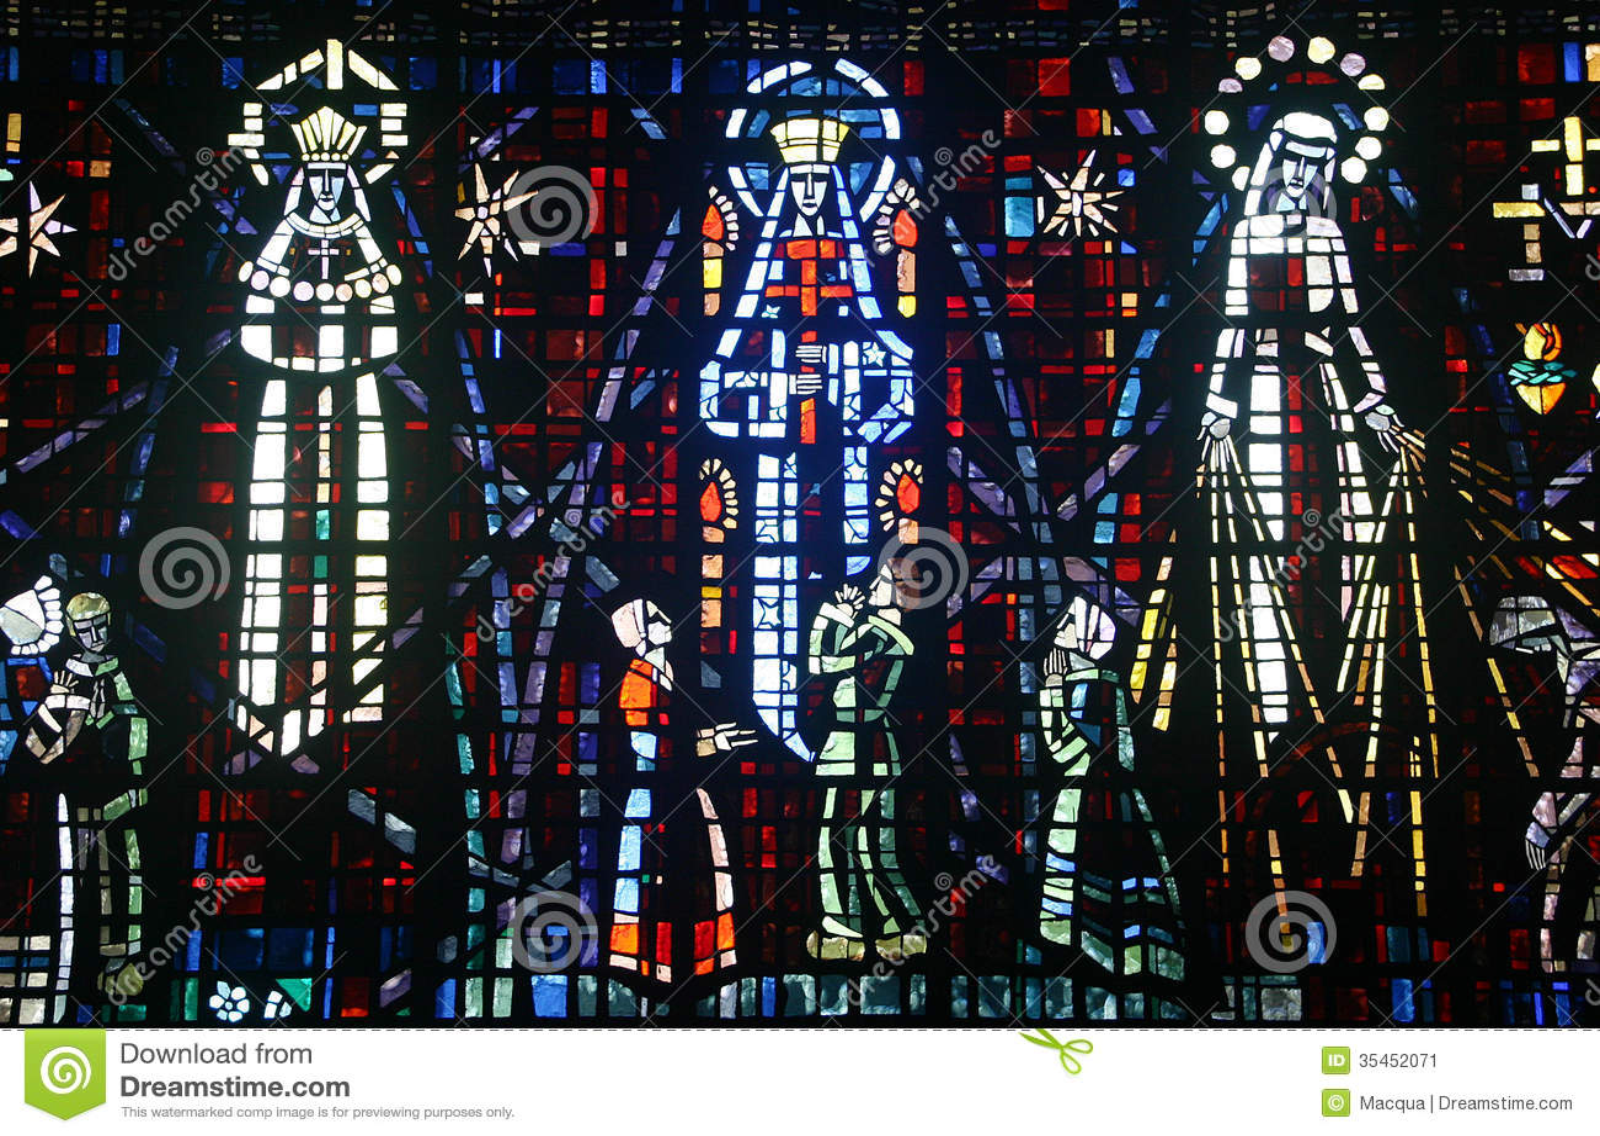 Colored glass window - Church - Notre Dame de Lourdes - Casablanca Morocco